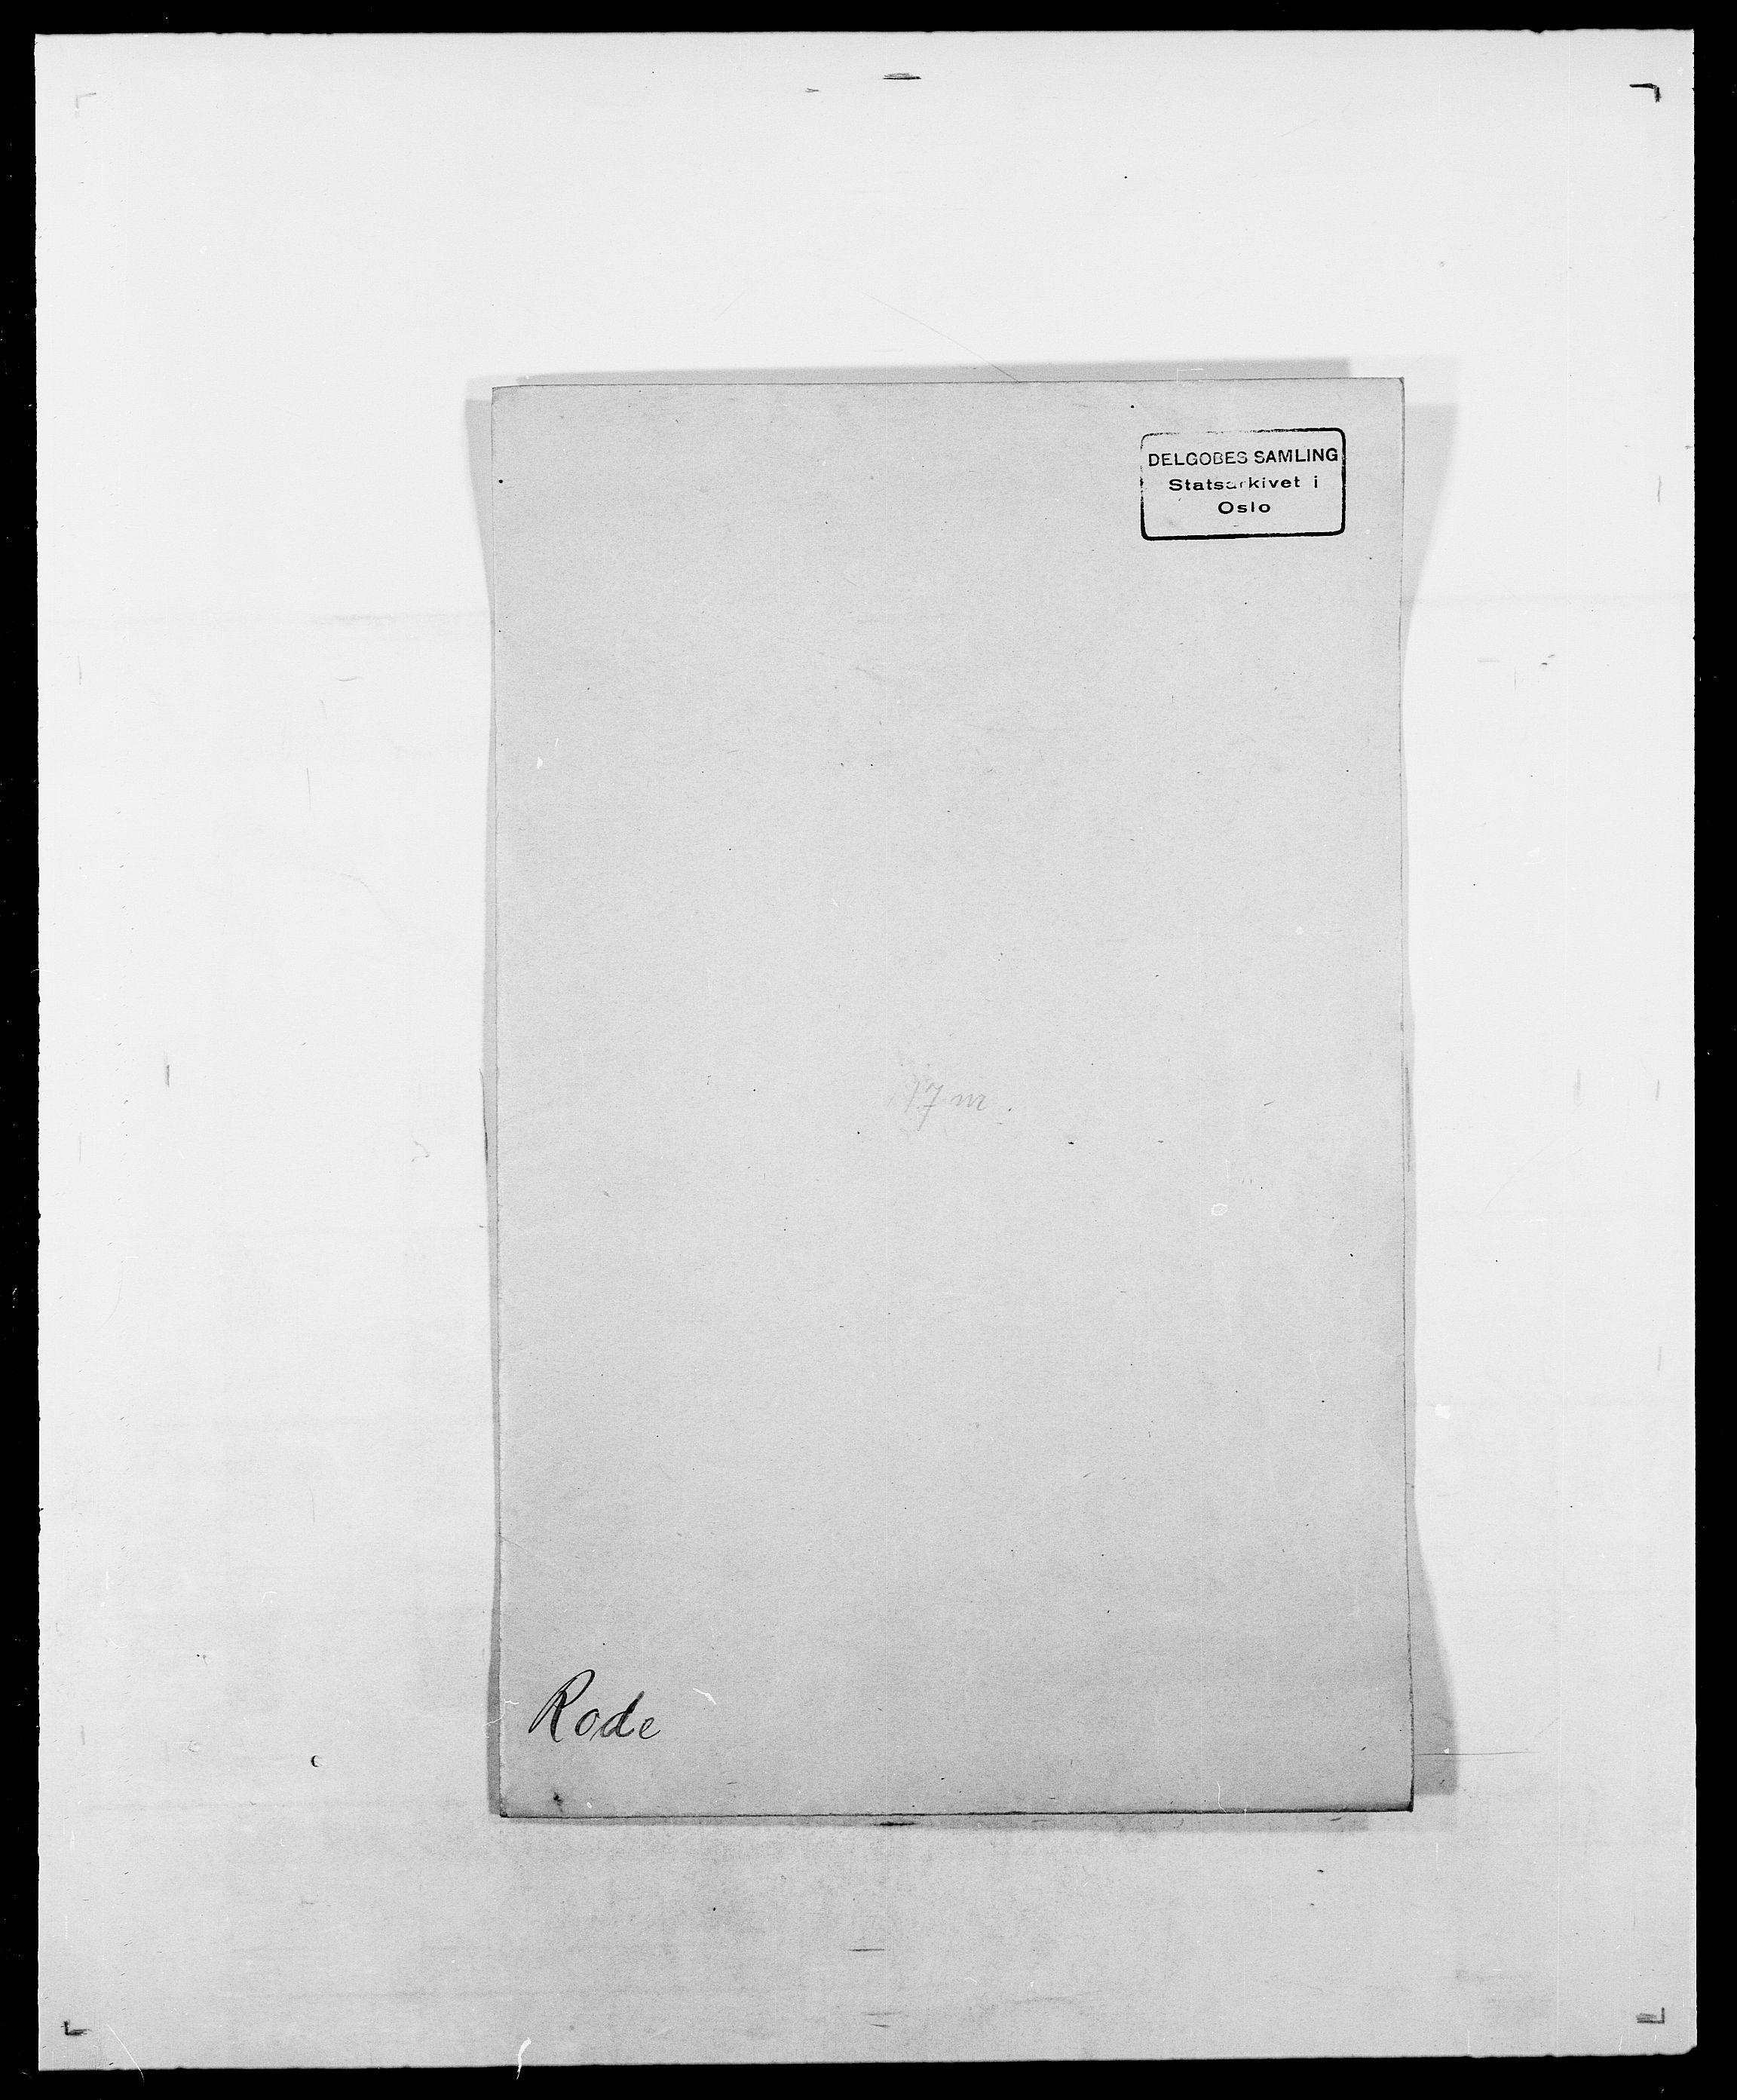 SAO, Delgobe, Charles Antoine - samling, D/Da/L0033: Roald - Røyem, s. 24